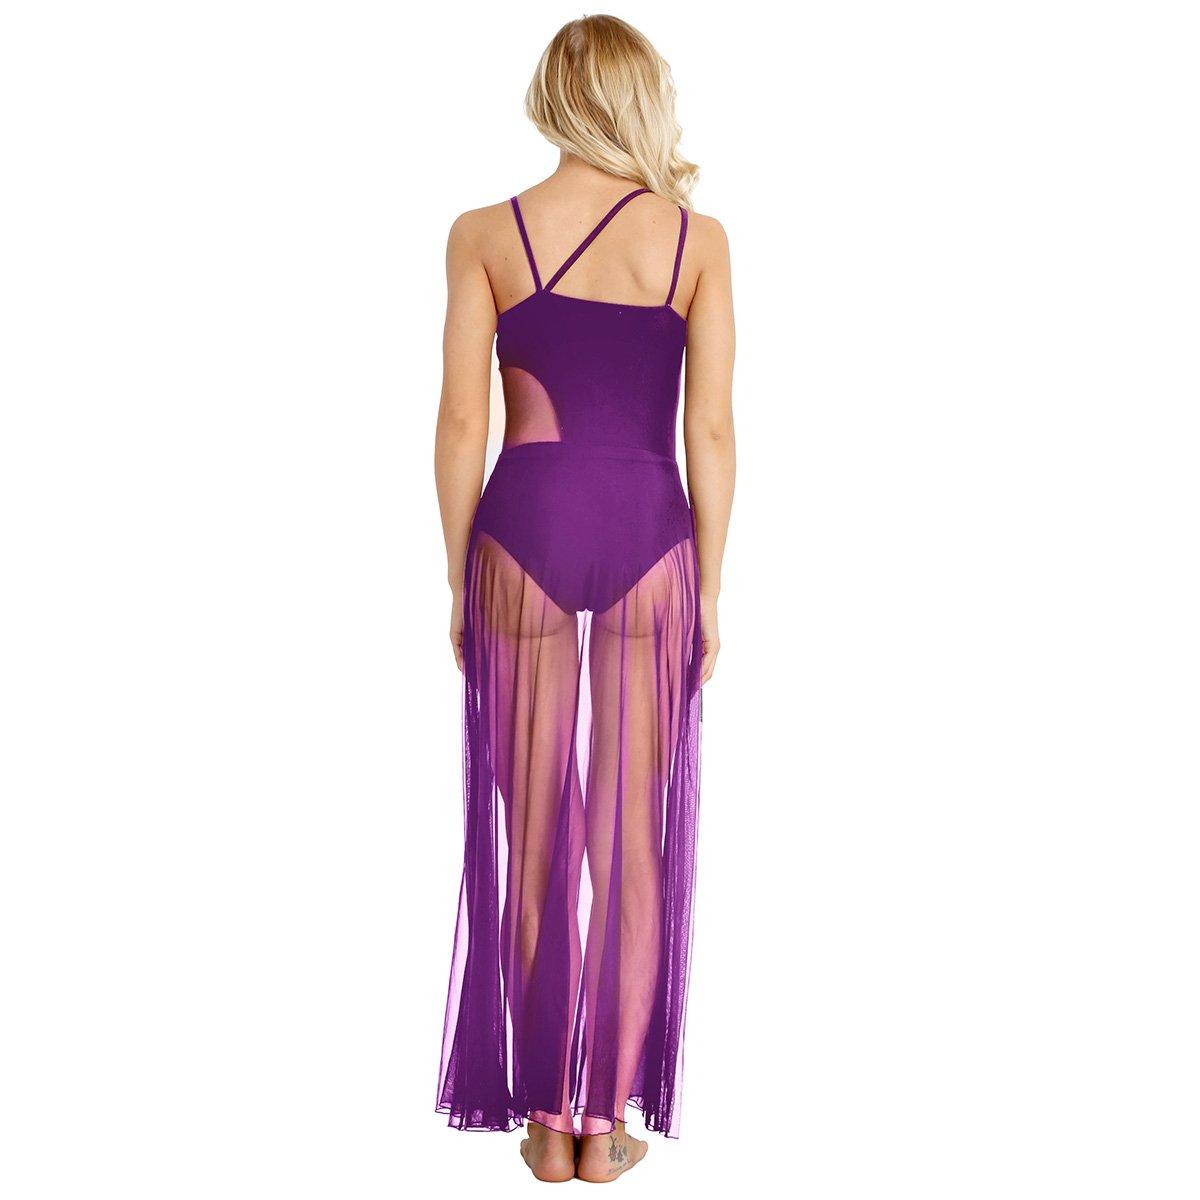 Alvivi Femme Robe Danse Latine Maille Transparent Robe de Danse Classique Moderne Rumba Zumba Salsa Valse Jazz Tango Gymnastique Robe Performance Dancewear XS-XL